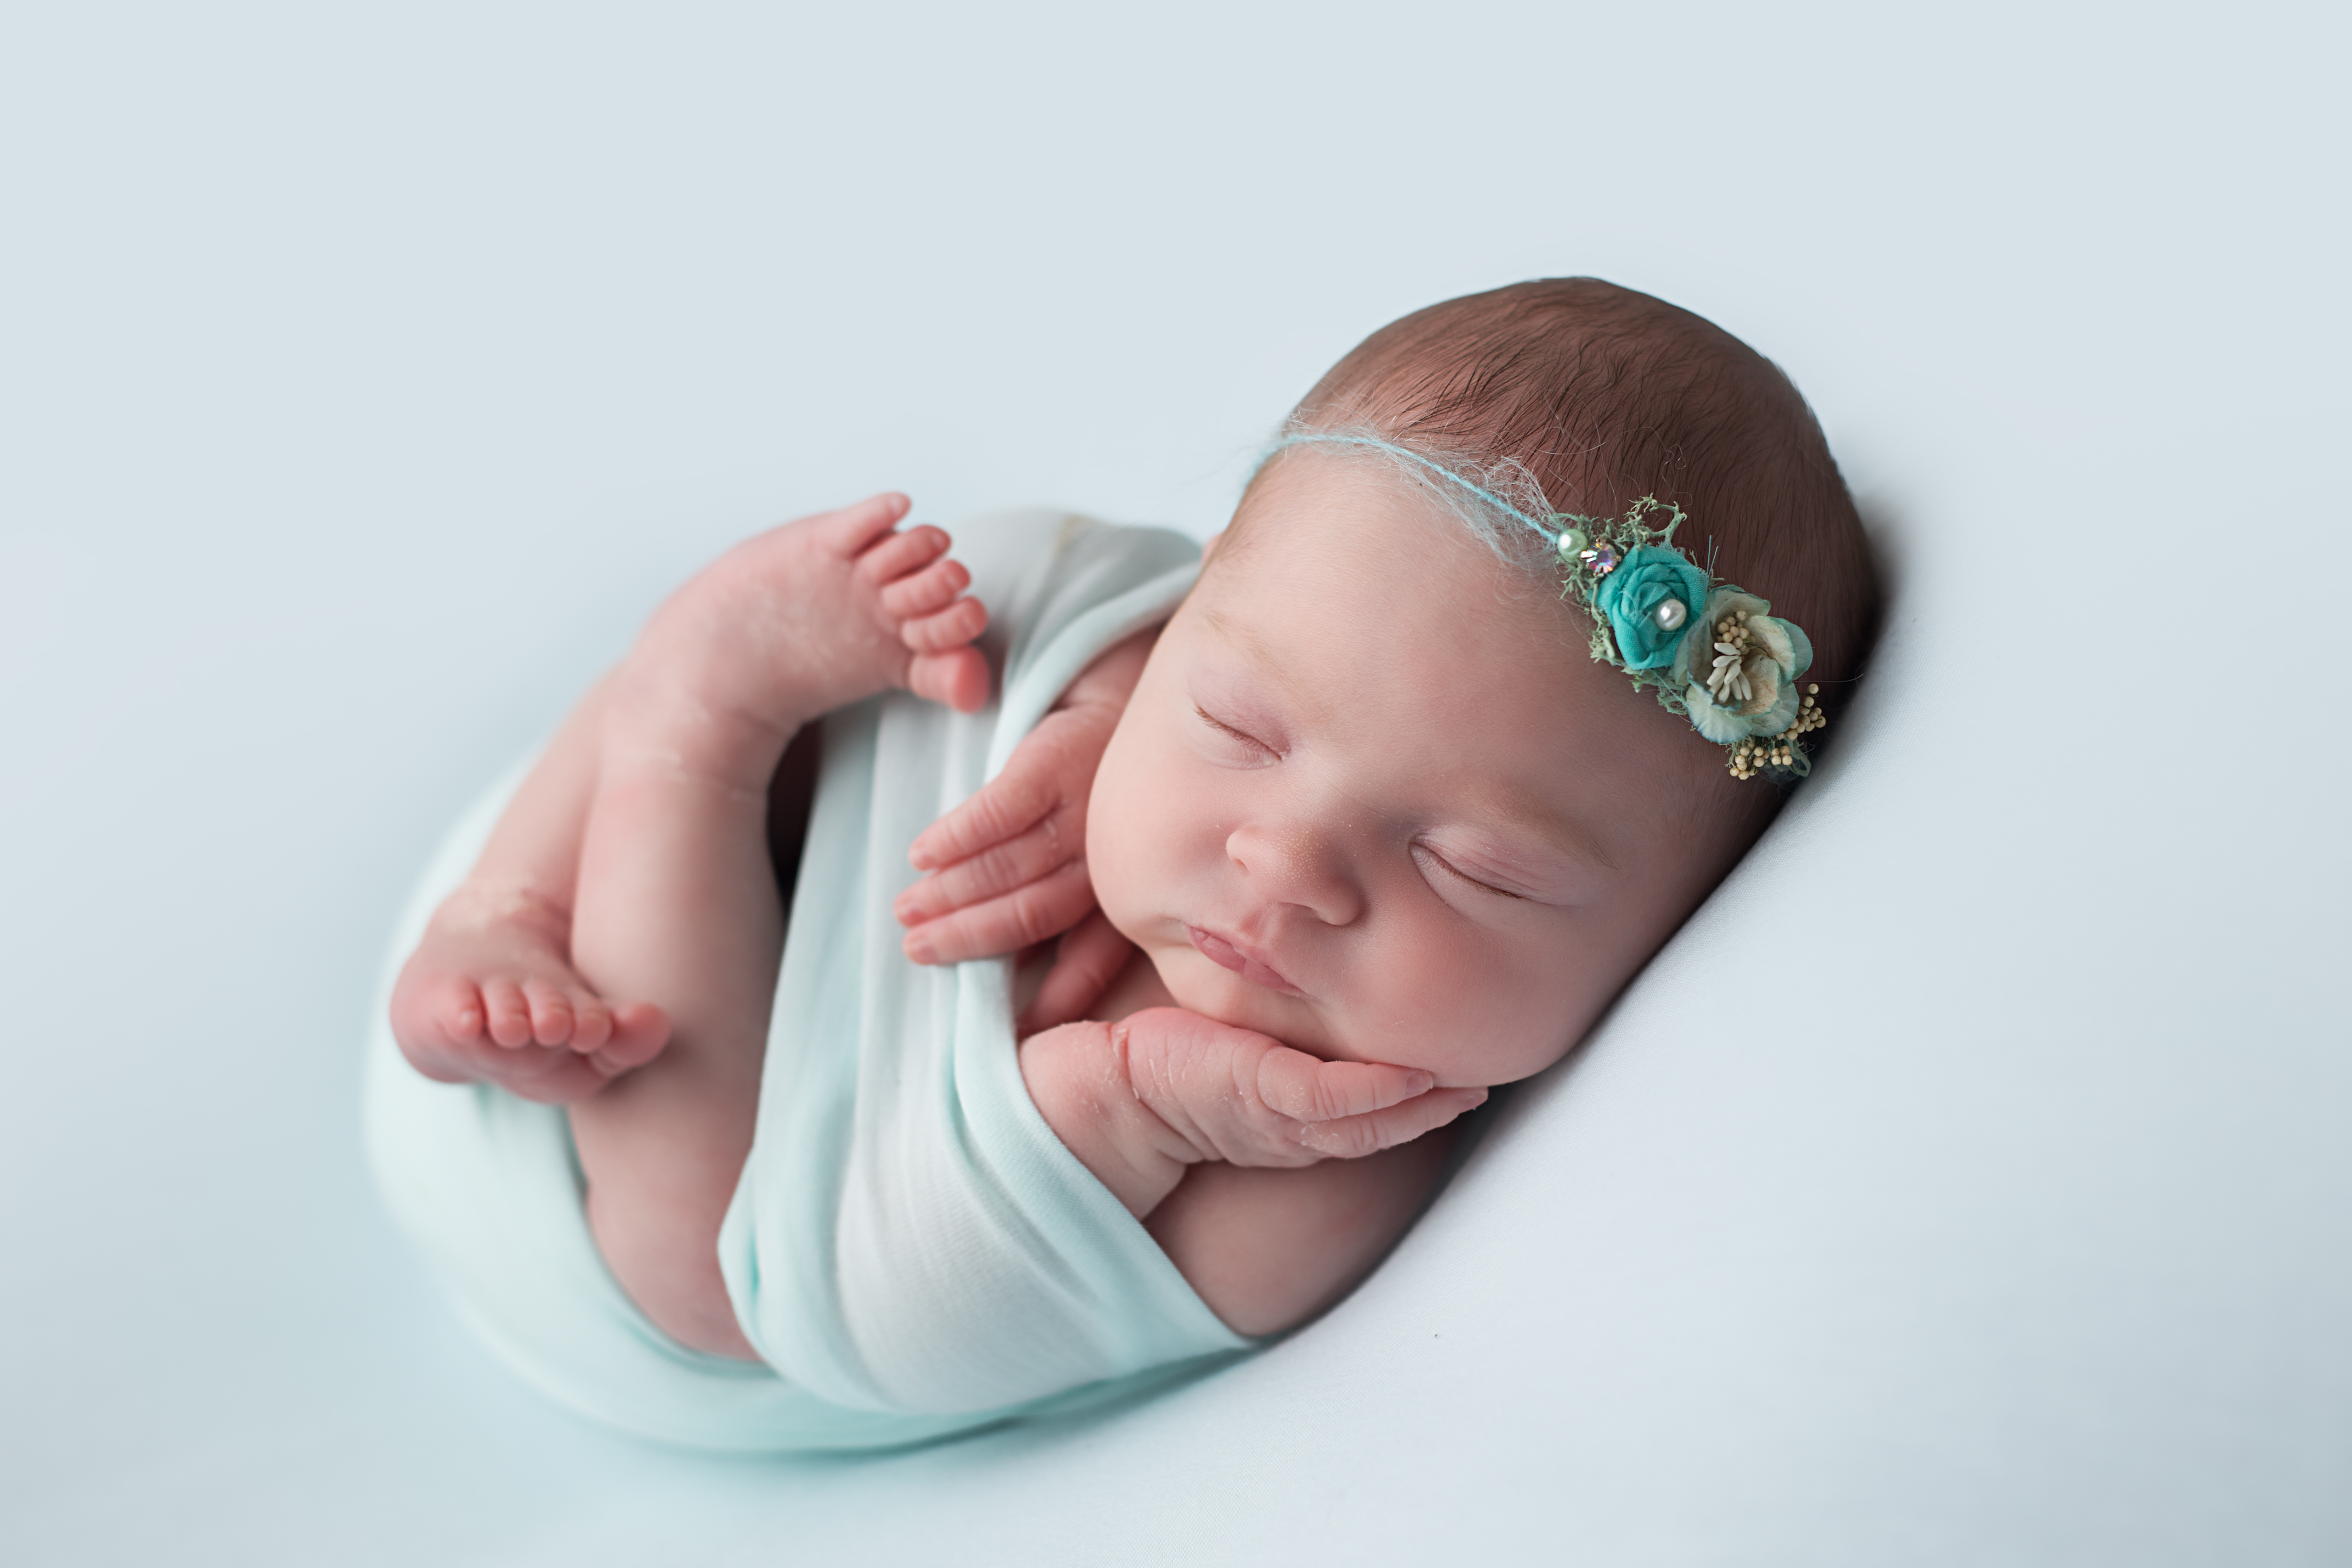 baby photo shoot glasgow - baby on mint backdrop